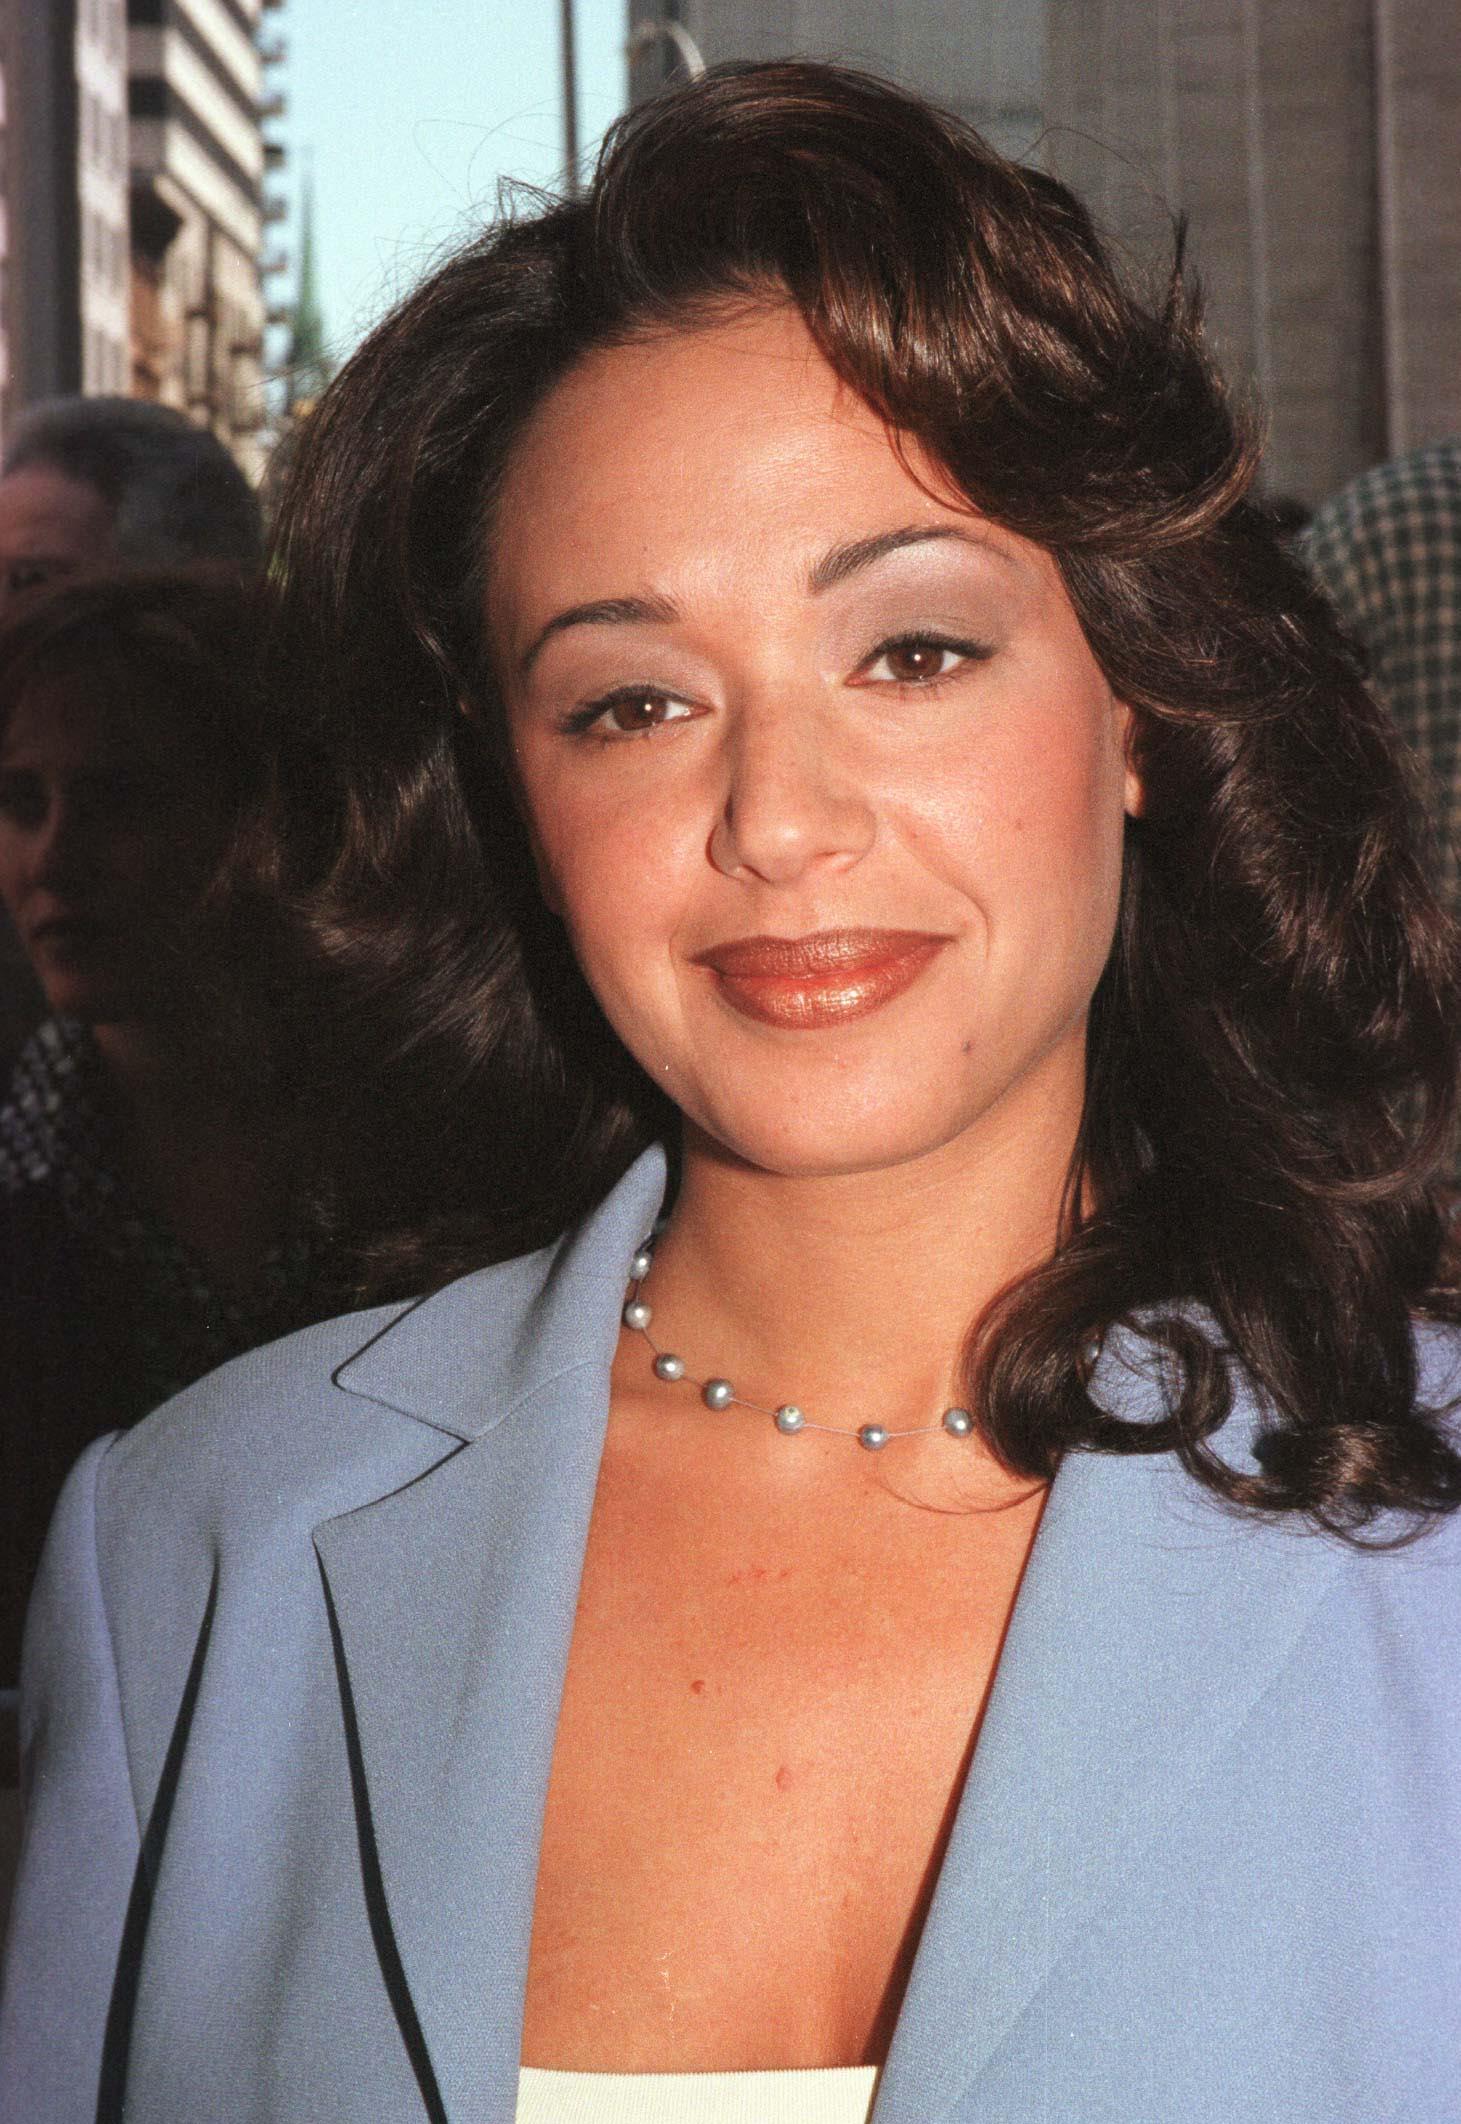 Huge 1990s Bi Level Remodel: Did Leah Remini Get Plastic Surgery? Experts Weigh In